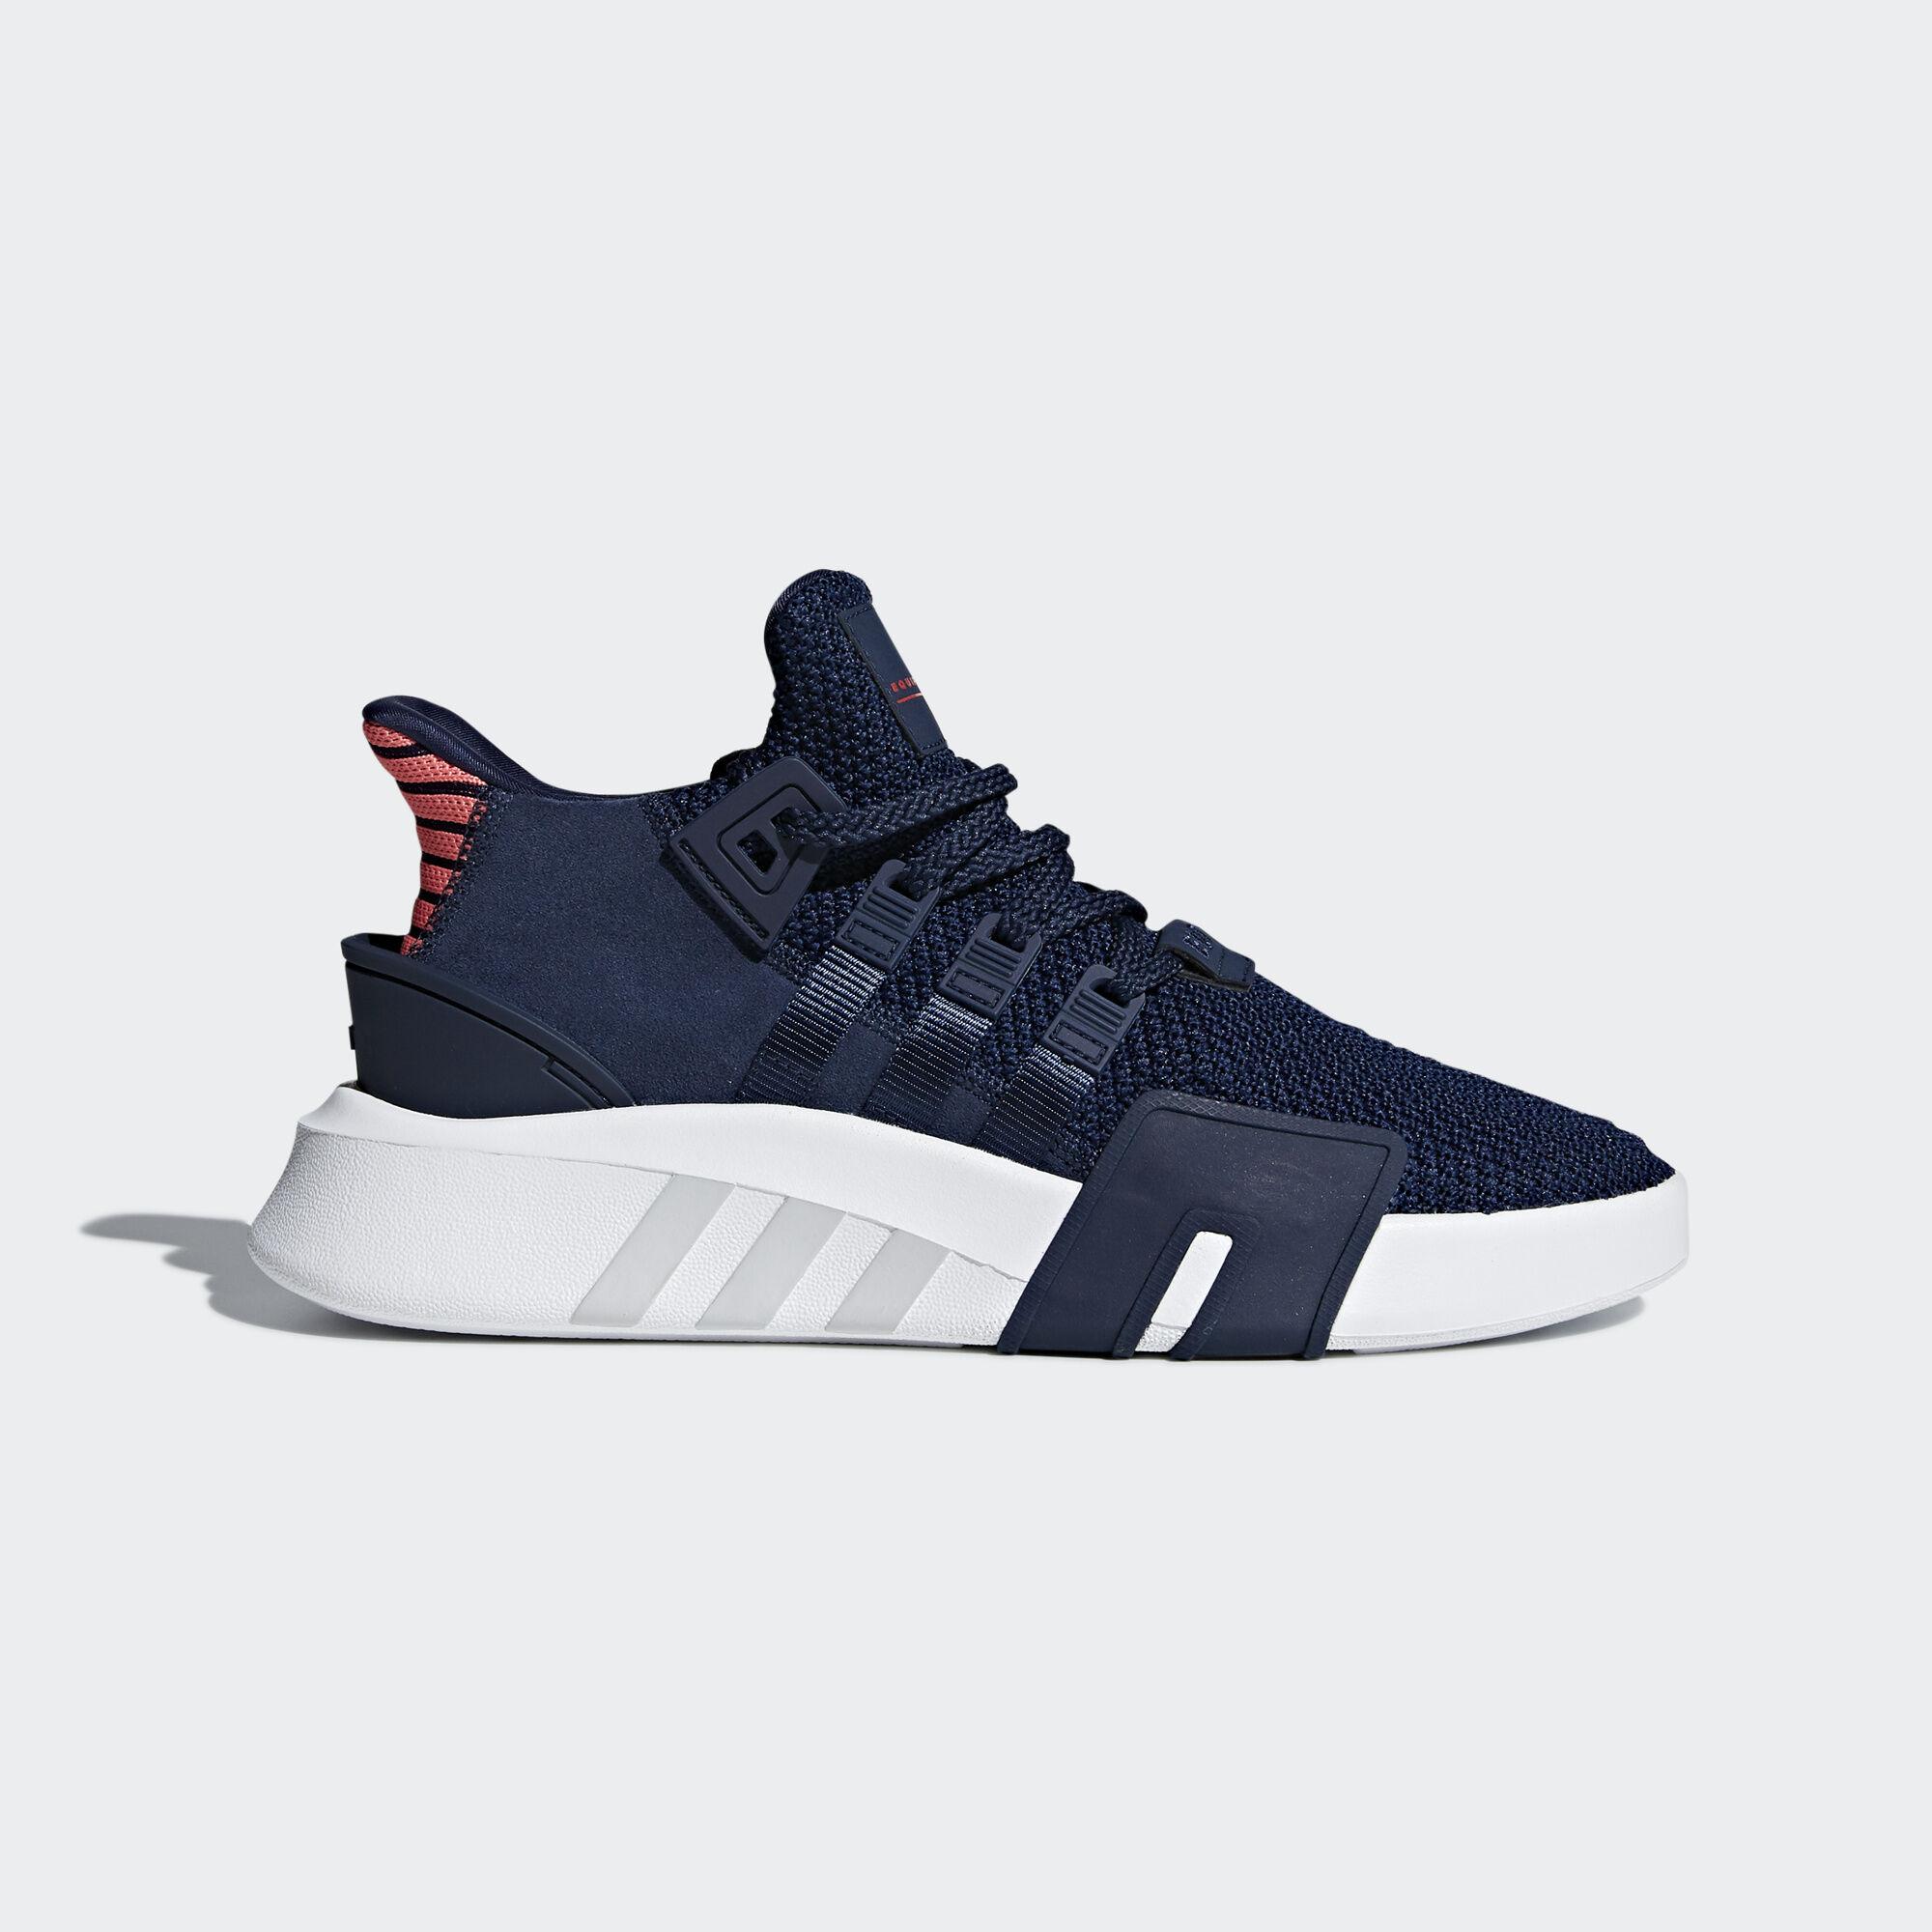 adidas EQT Bask ADV Carbon / Carbon / Collegiate Navy Sneaker CQ2994